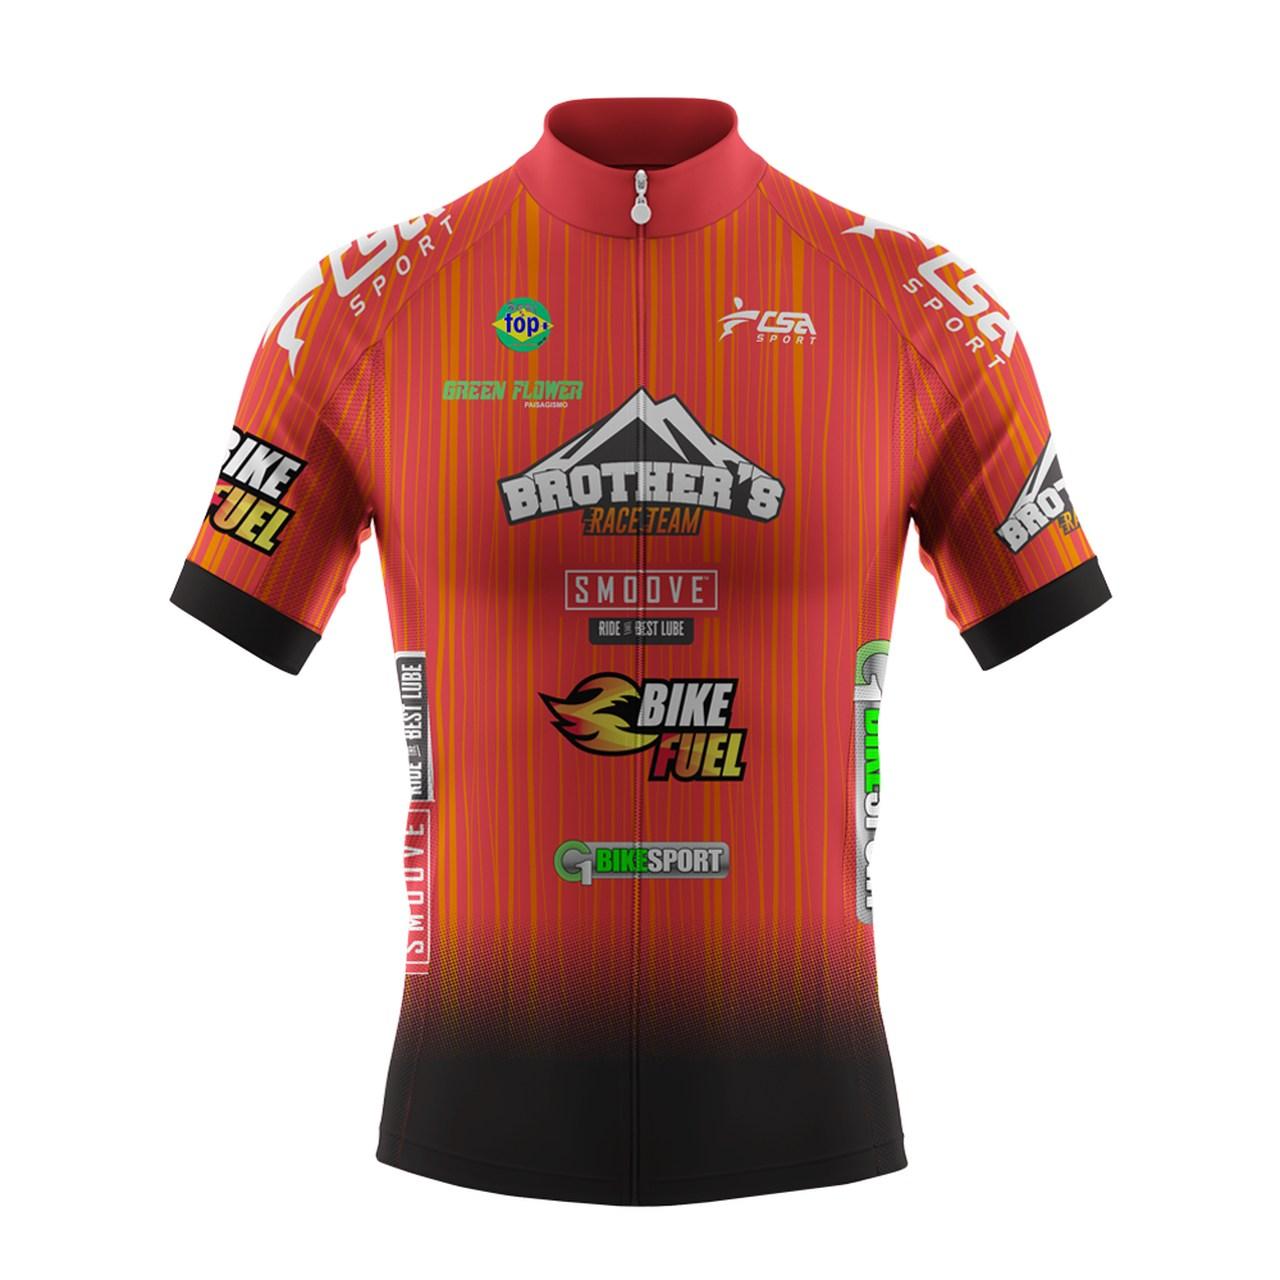 Camisa Personalizada Brother's Race Team  - Mostruário CSA Sport